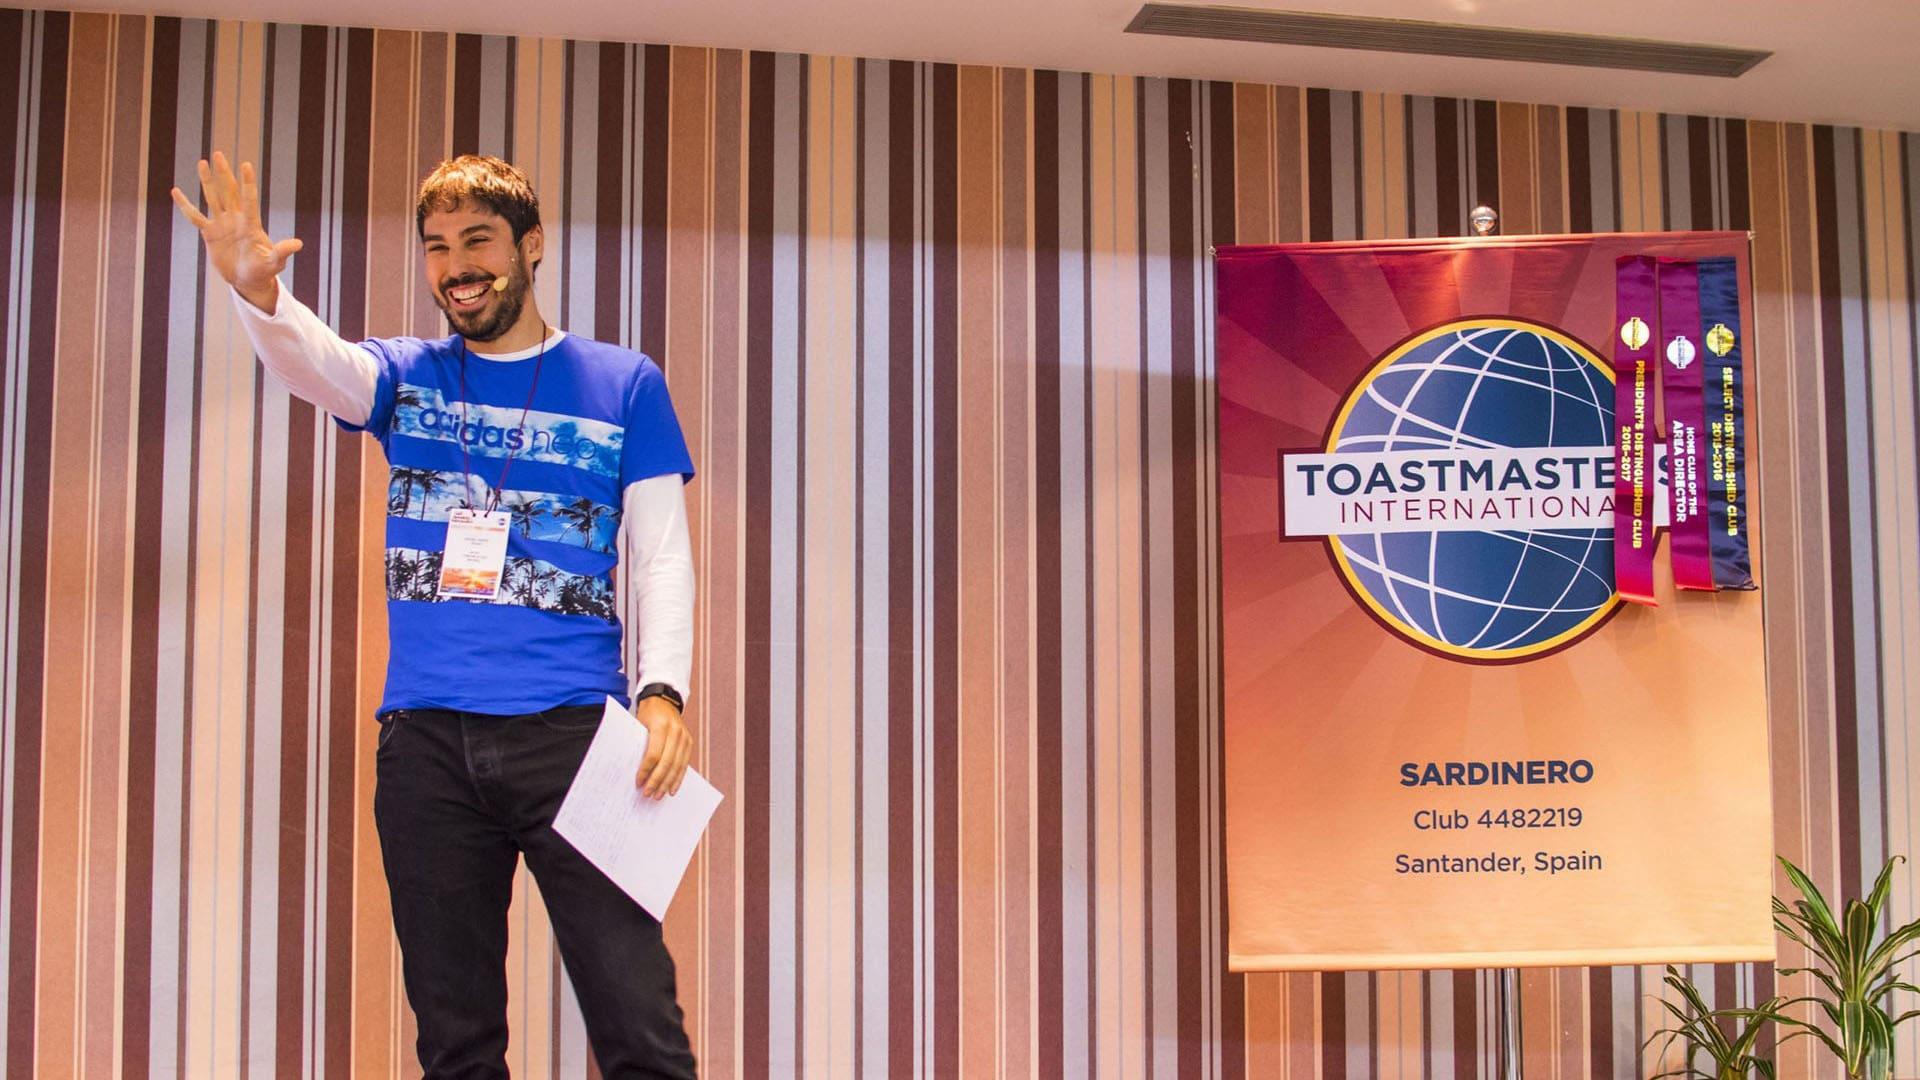 Toastmaster Championship (1)